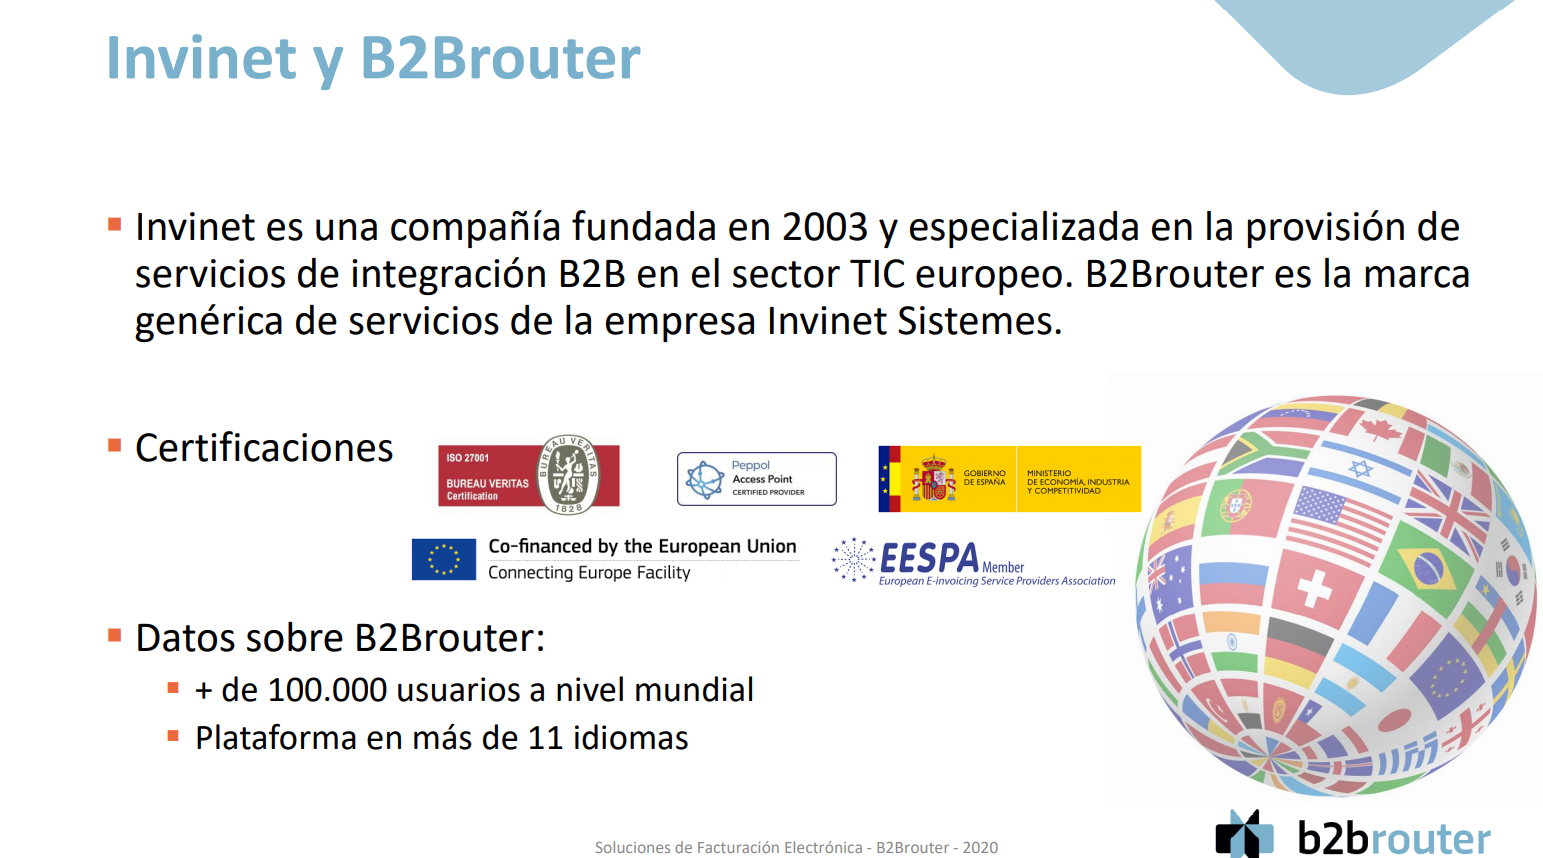 webinar_b2brouter_1